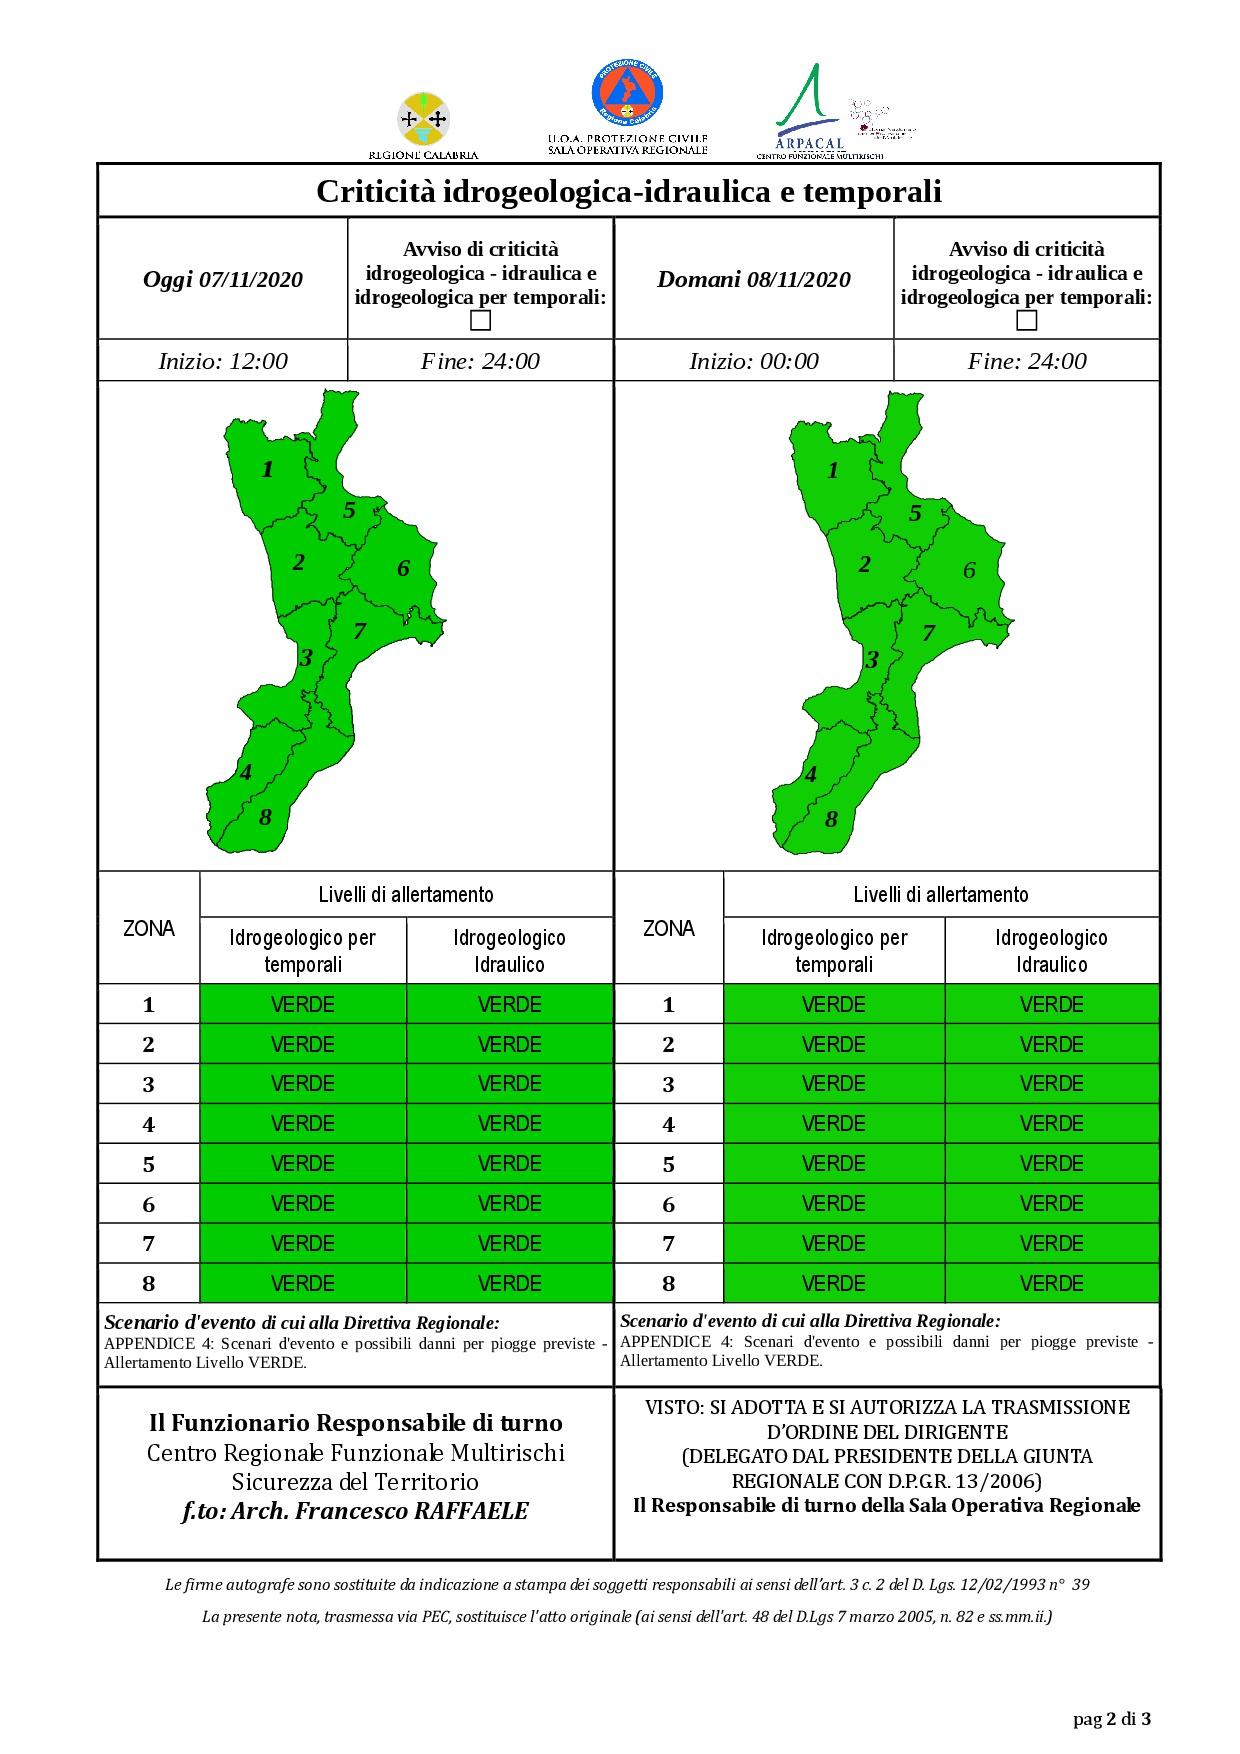 Criticità idrogeologica-idraulica e temporali in Calabria 07-11-2020